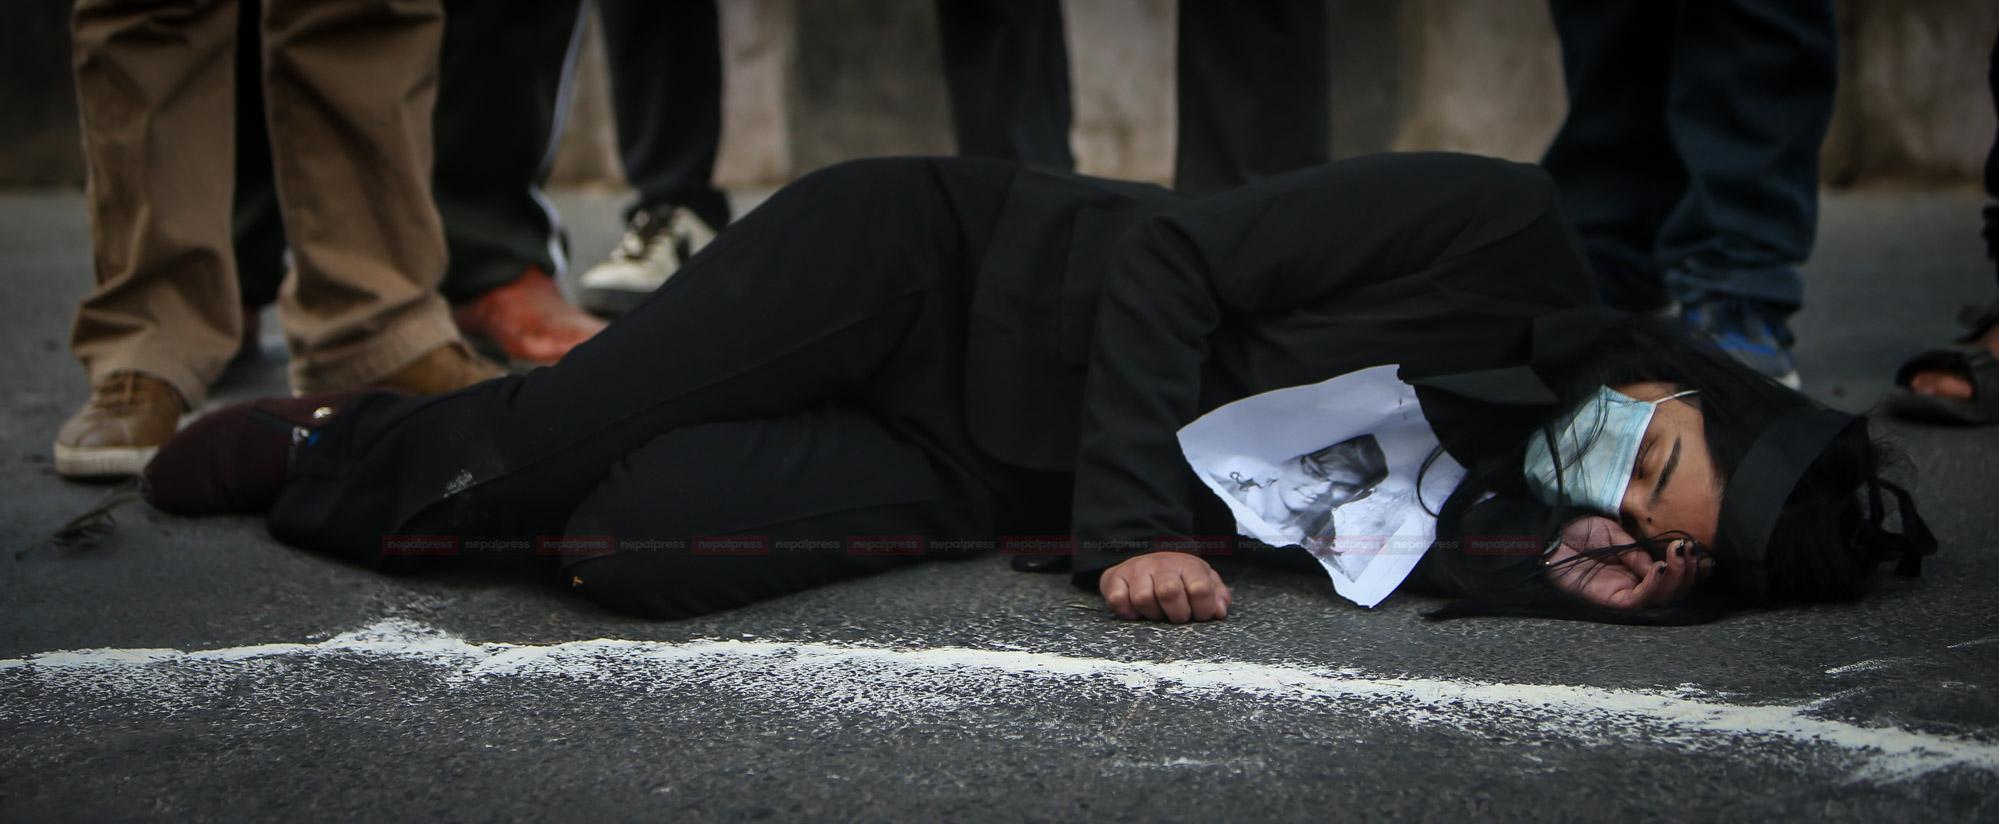 ओलीतन्त्र भर्सेस प्रचण्ड–माधव भर्सेस नेपाली जनता (फाेटाे फिचर)